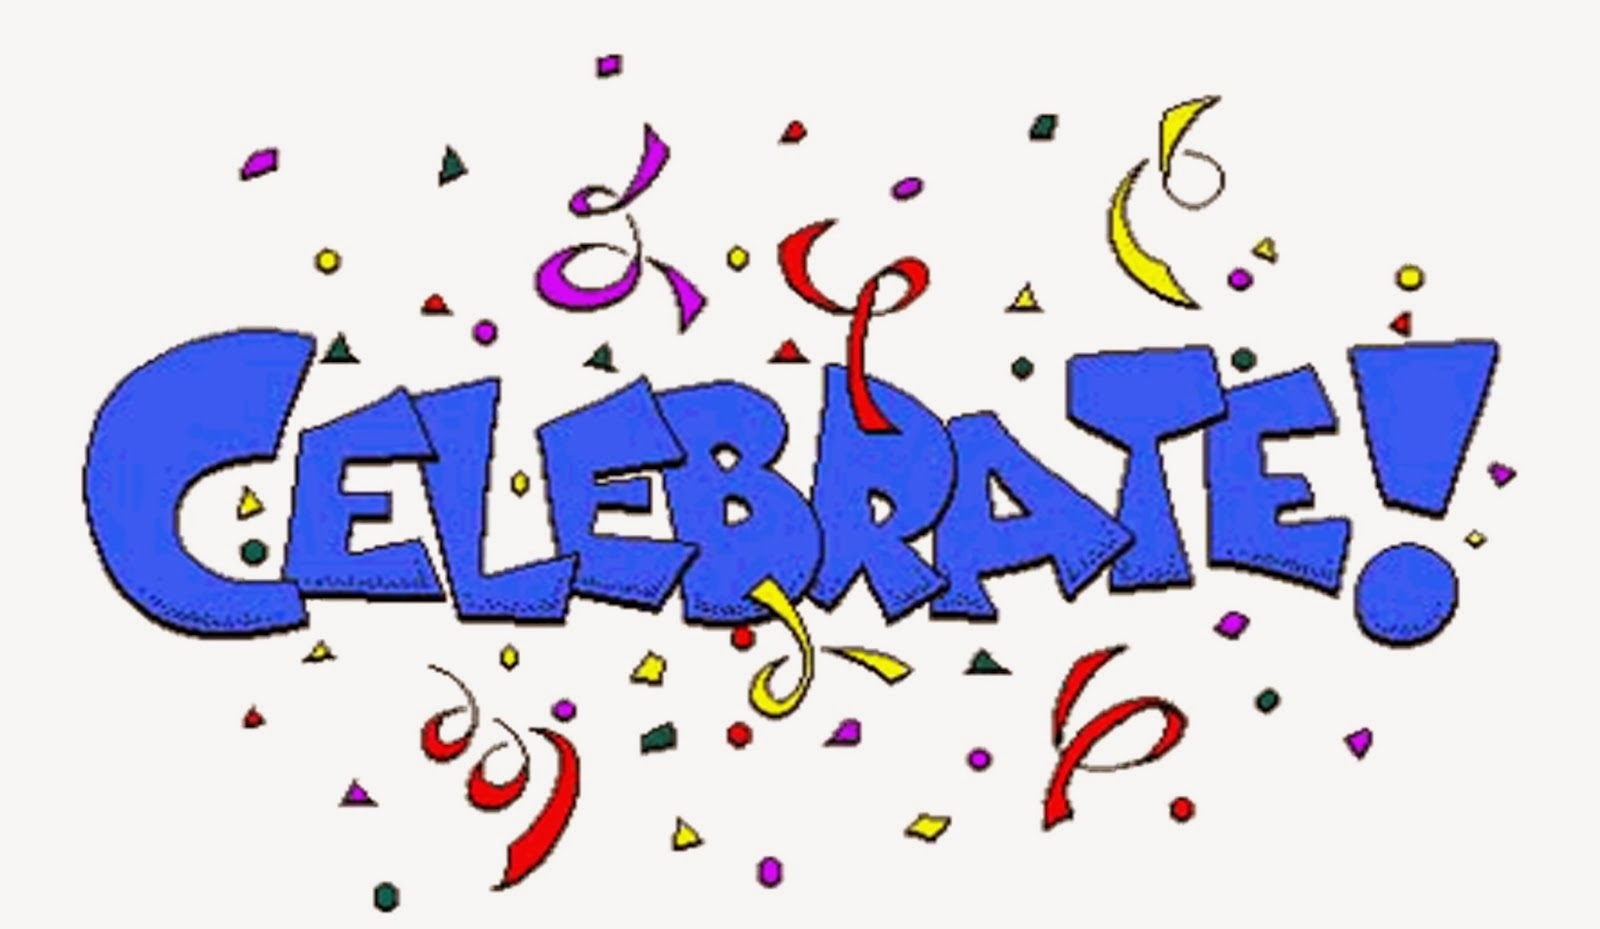 Celebrate clipart award, Celebrate award Transparent FREE for ...